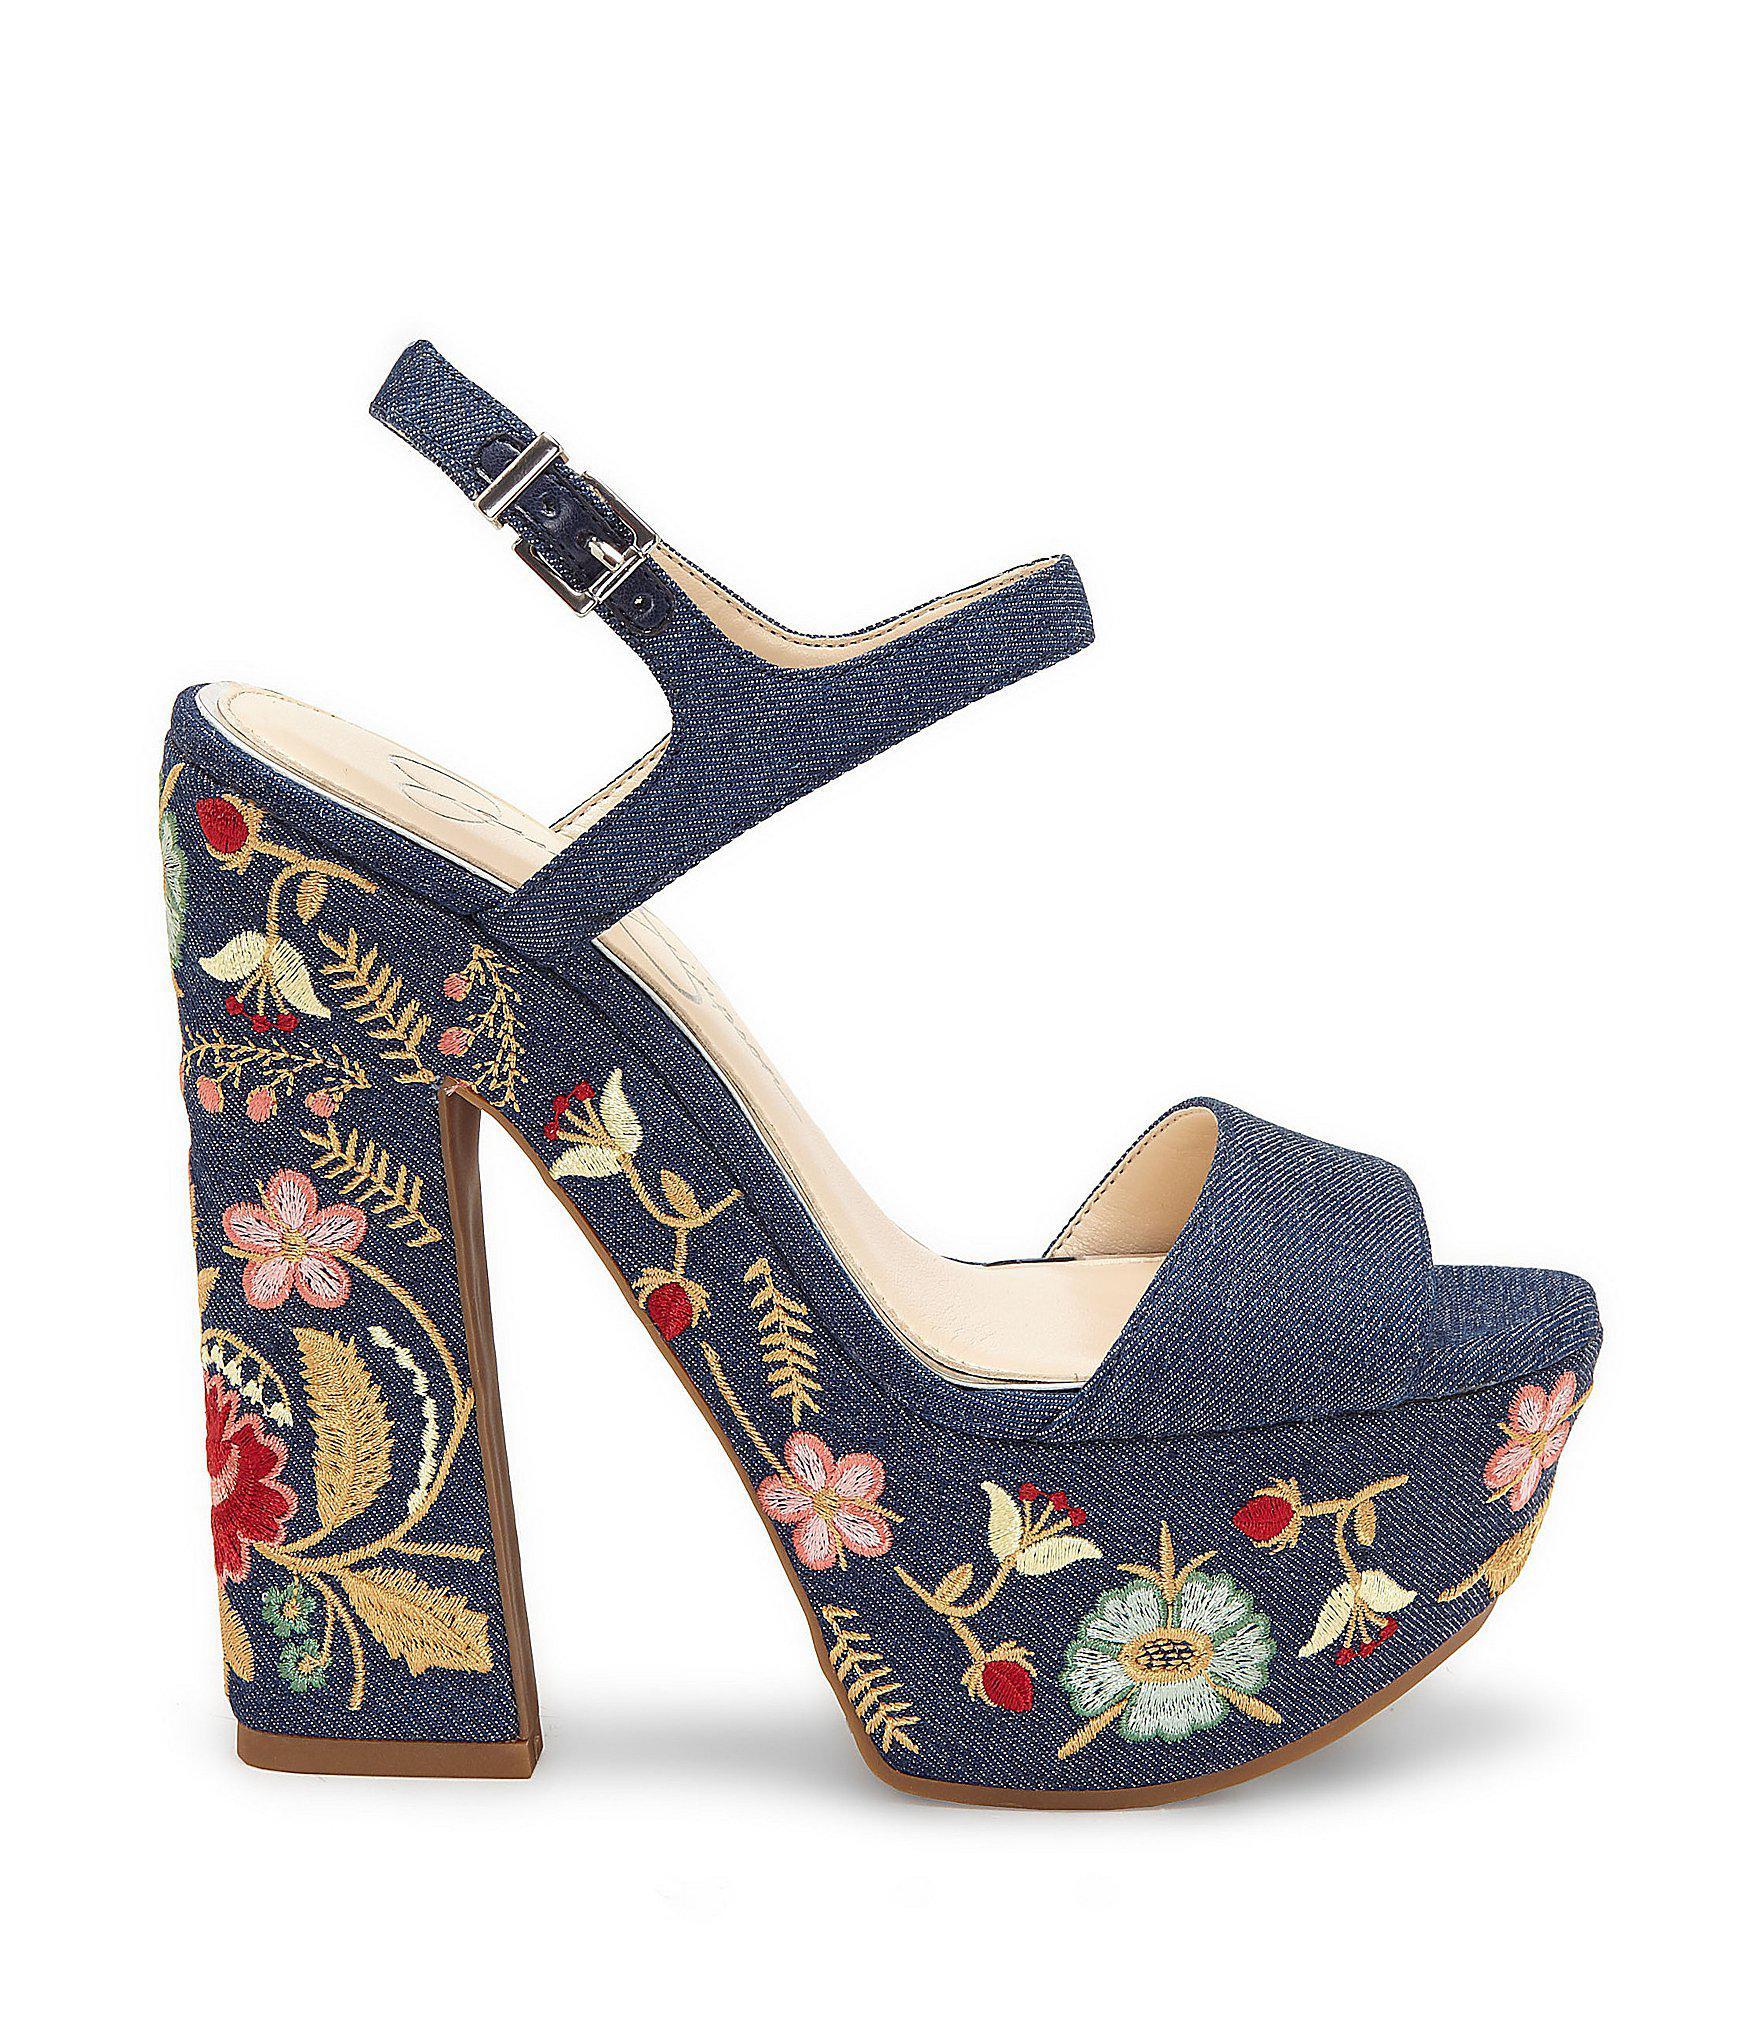 b05682c33663 Lyst - Jessica Simpson Divella2 Denim Floral Platform Sandal in Blue